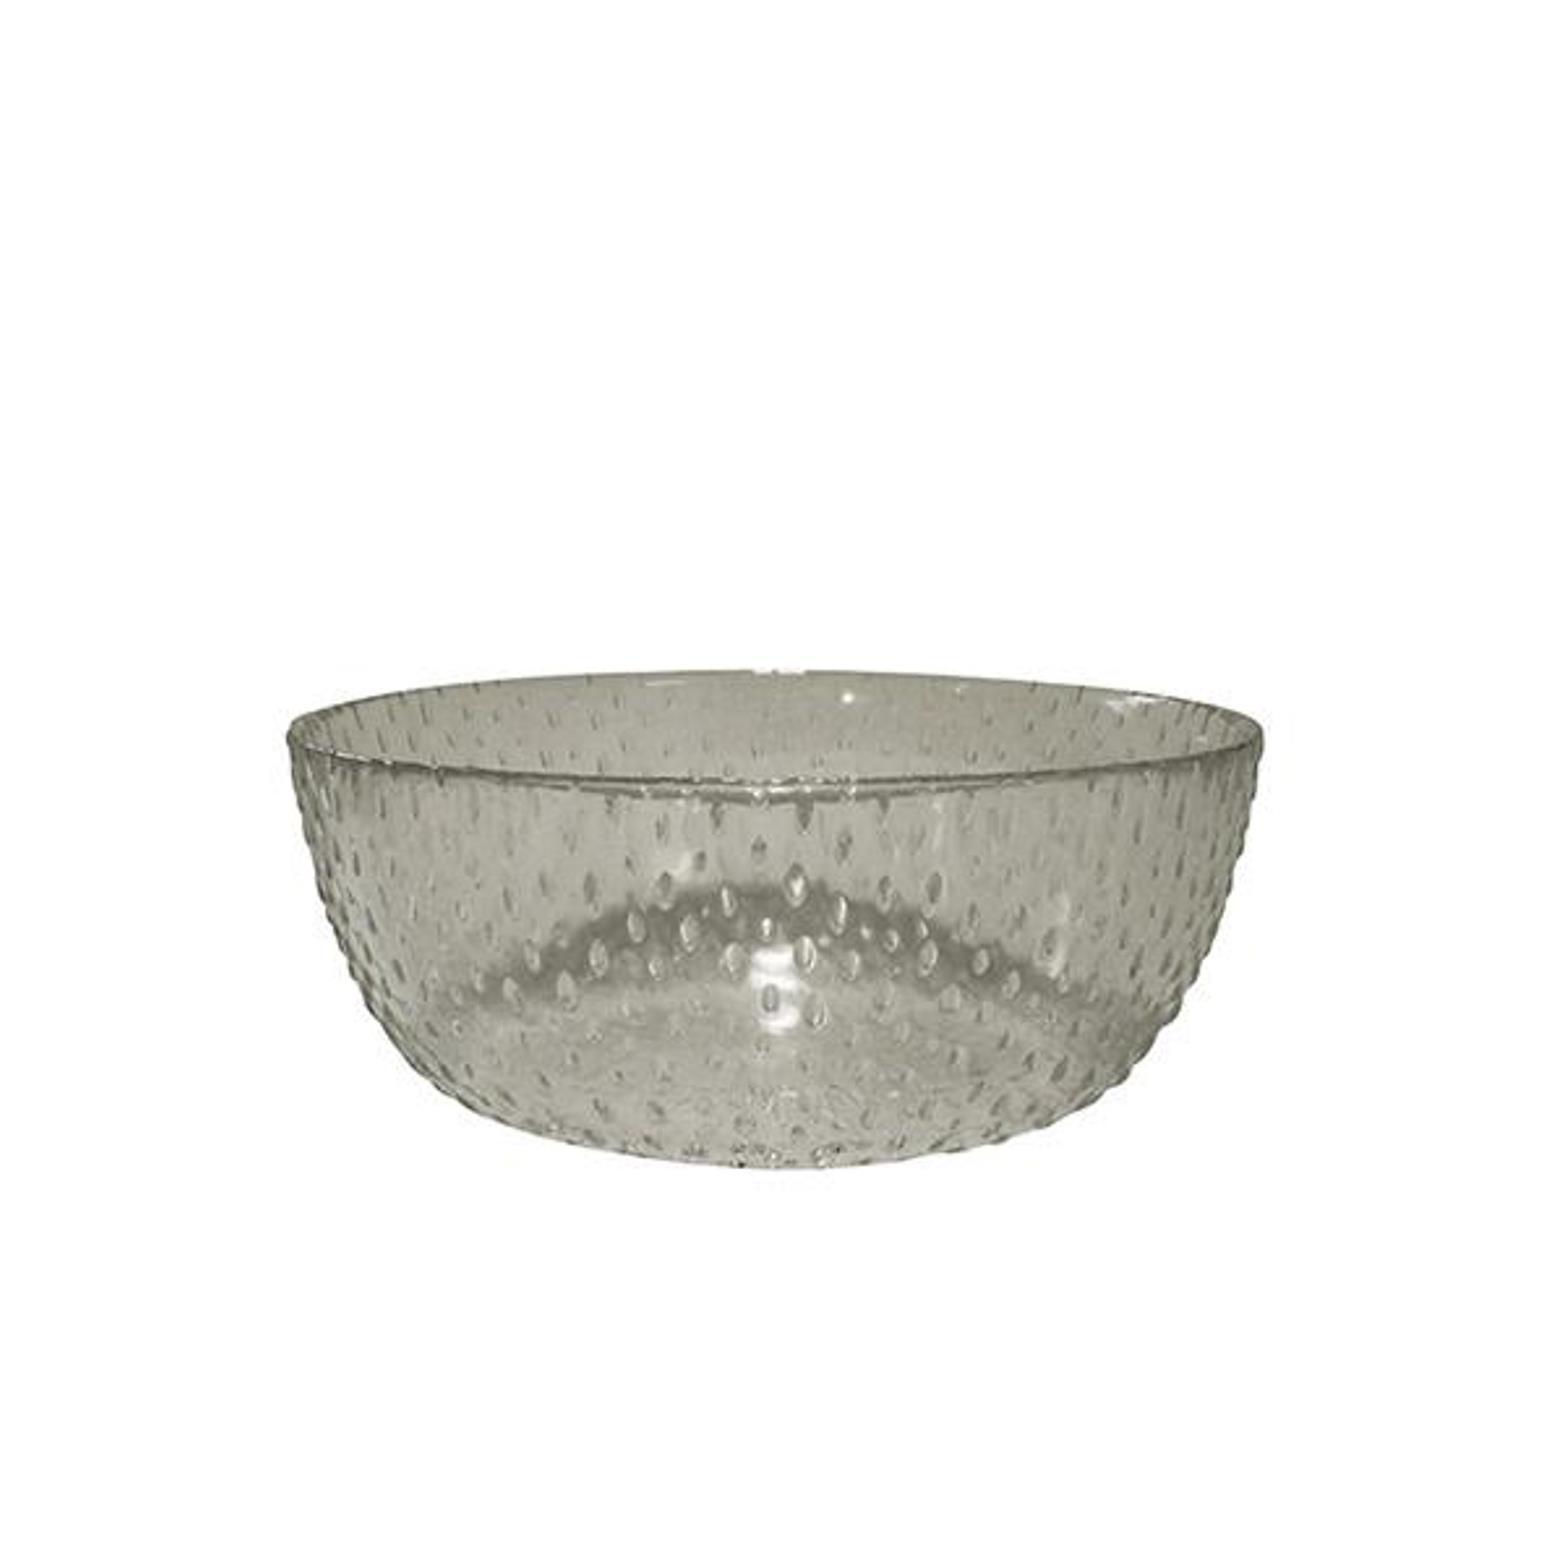 Онлайн каталог PROMENU: Пиала Aida RAW, диаметр 26,5 см, высота 9 см, прозрачный серый                               15066